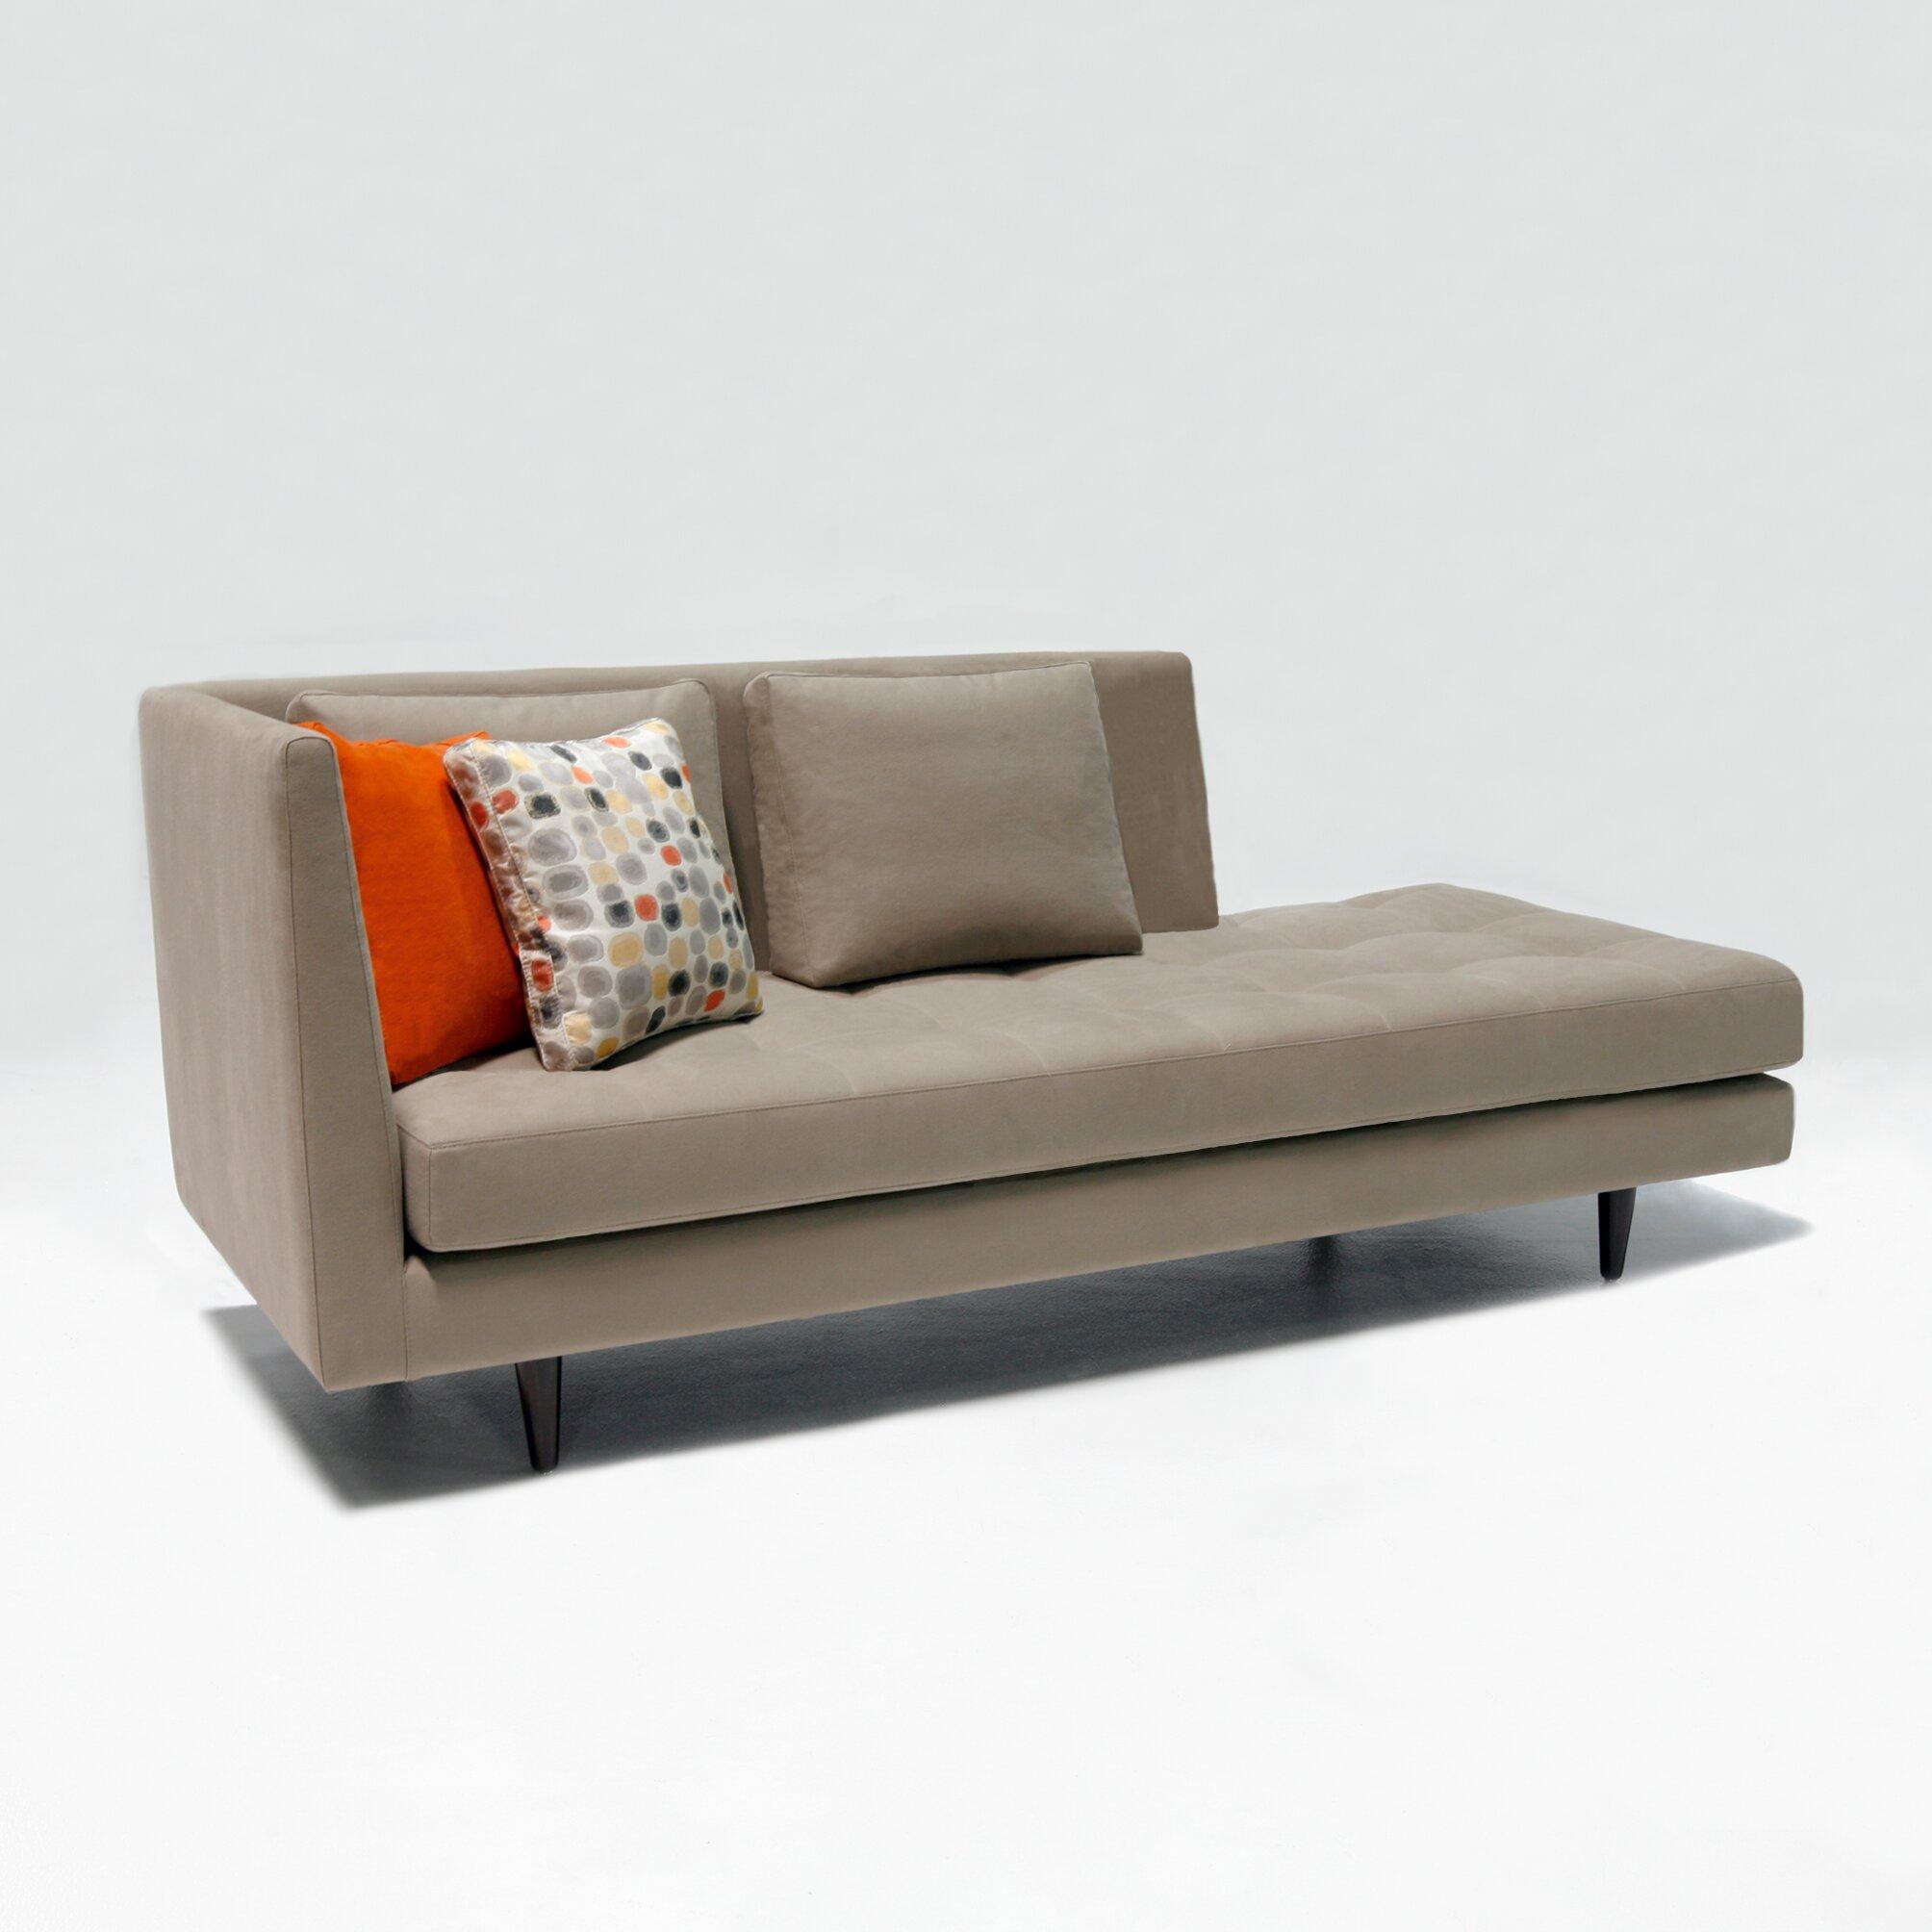 Jordan chaise lounge sofa wayfair for 2 chaise lounges sofa